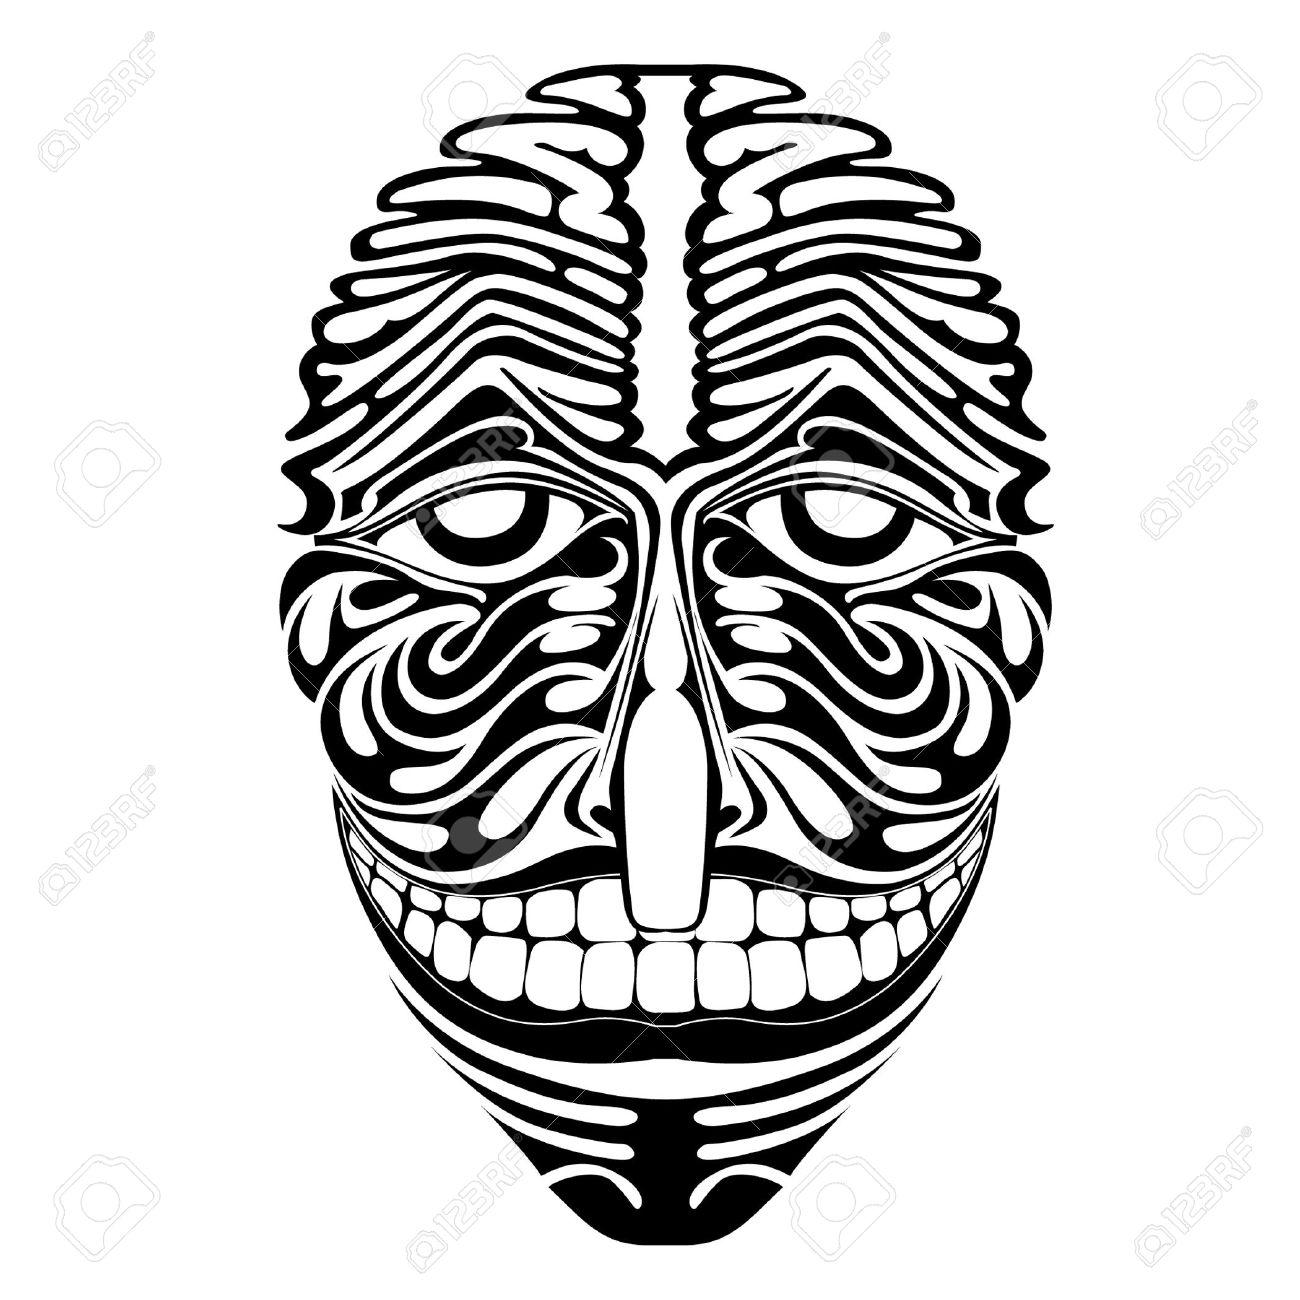 Spirit Demon Joker Face Silhouette Royalty Free Cliparts Vectors